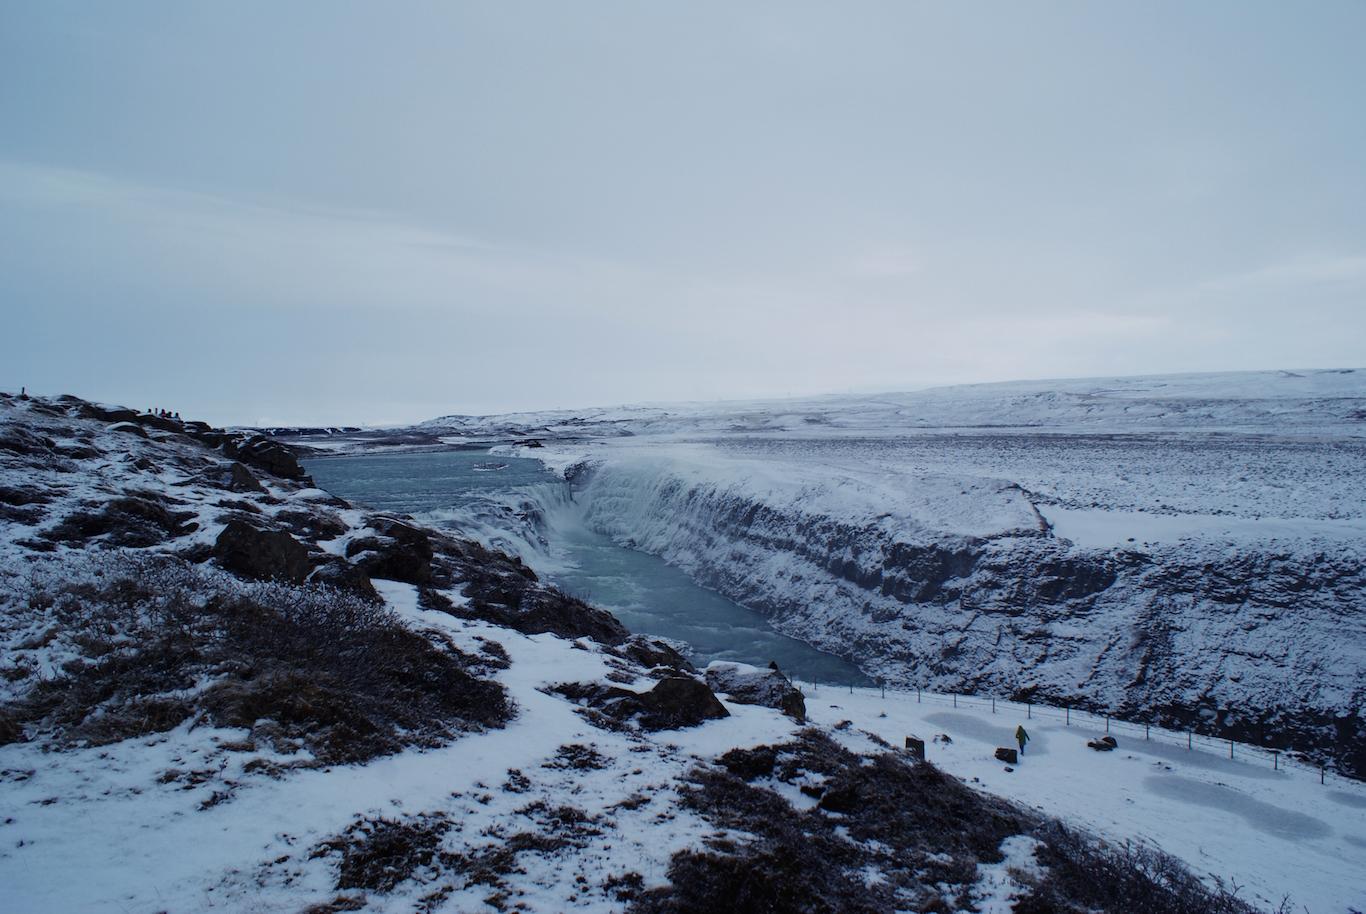 Iceland waterfalls in the winter - Gulfoss